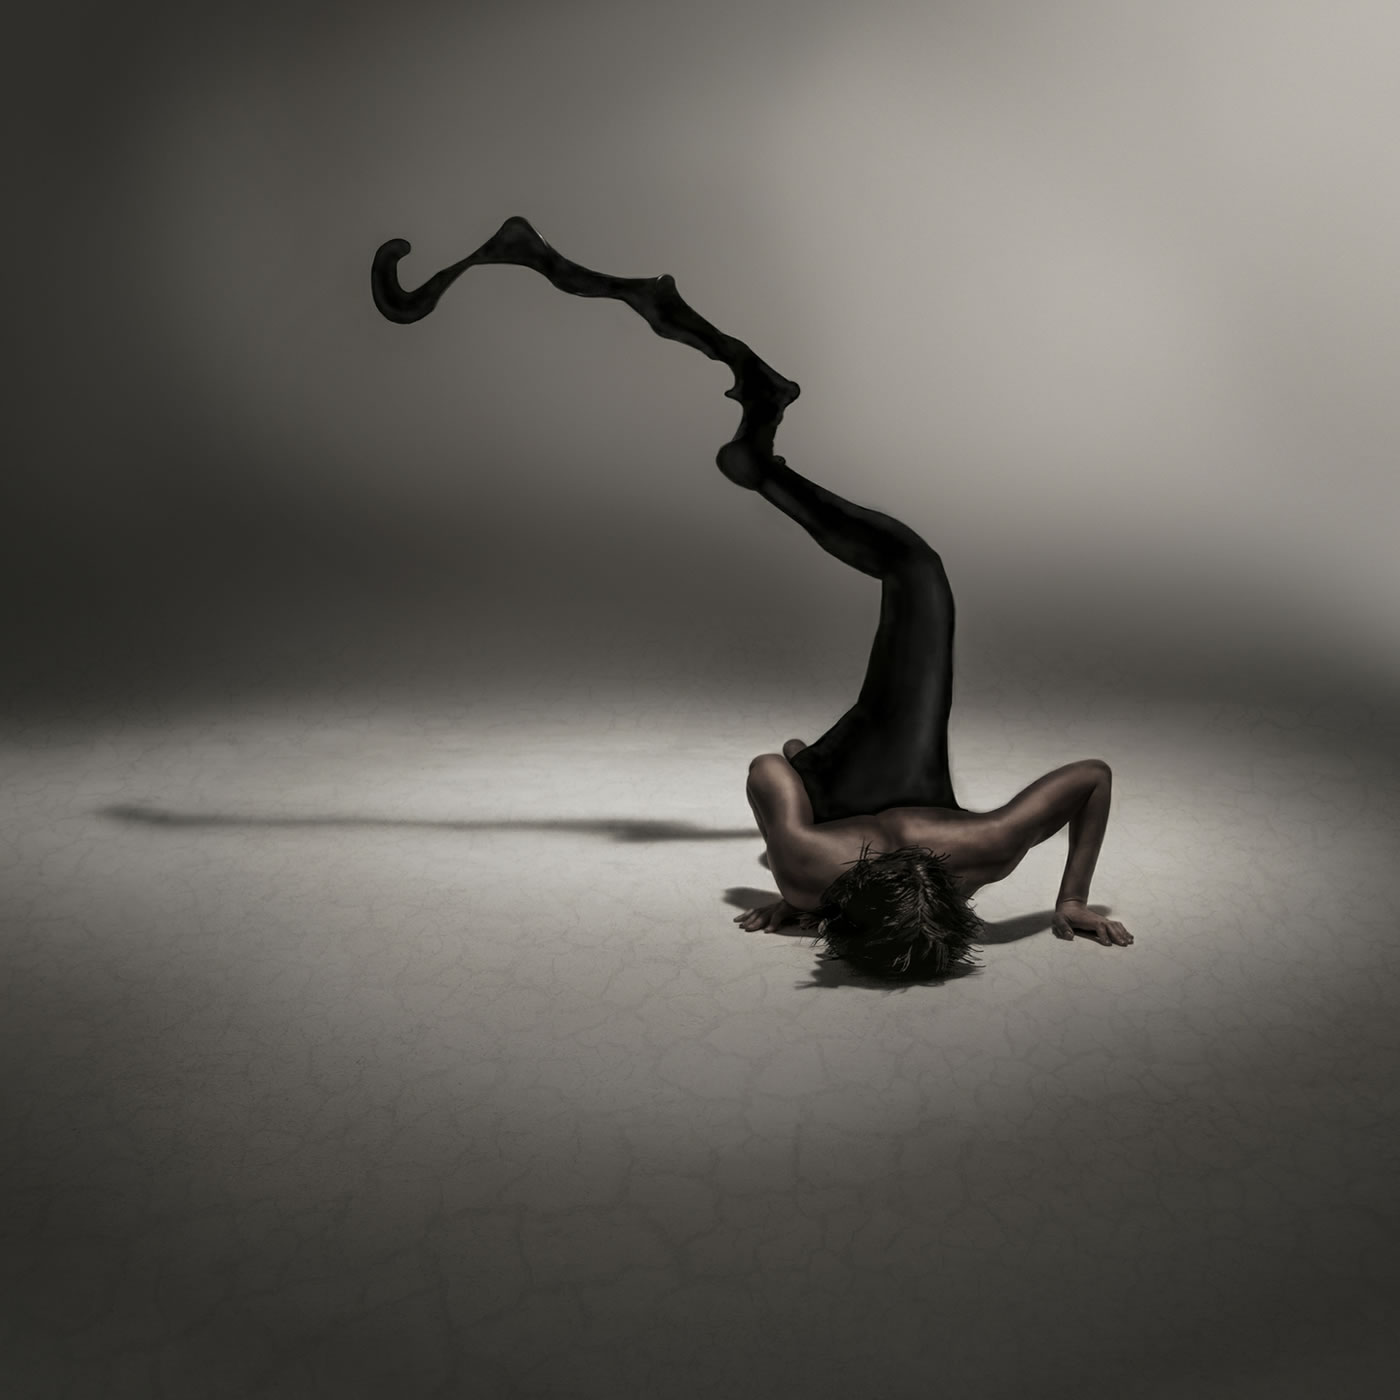 """Creatures"" gallery art exhibition by Shane Lavancher"